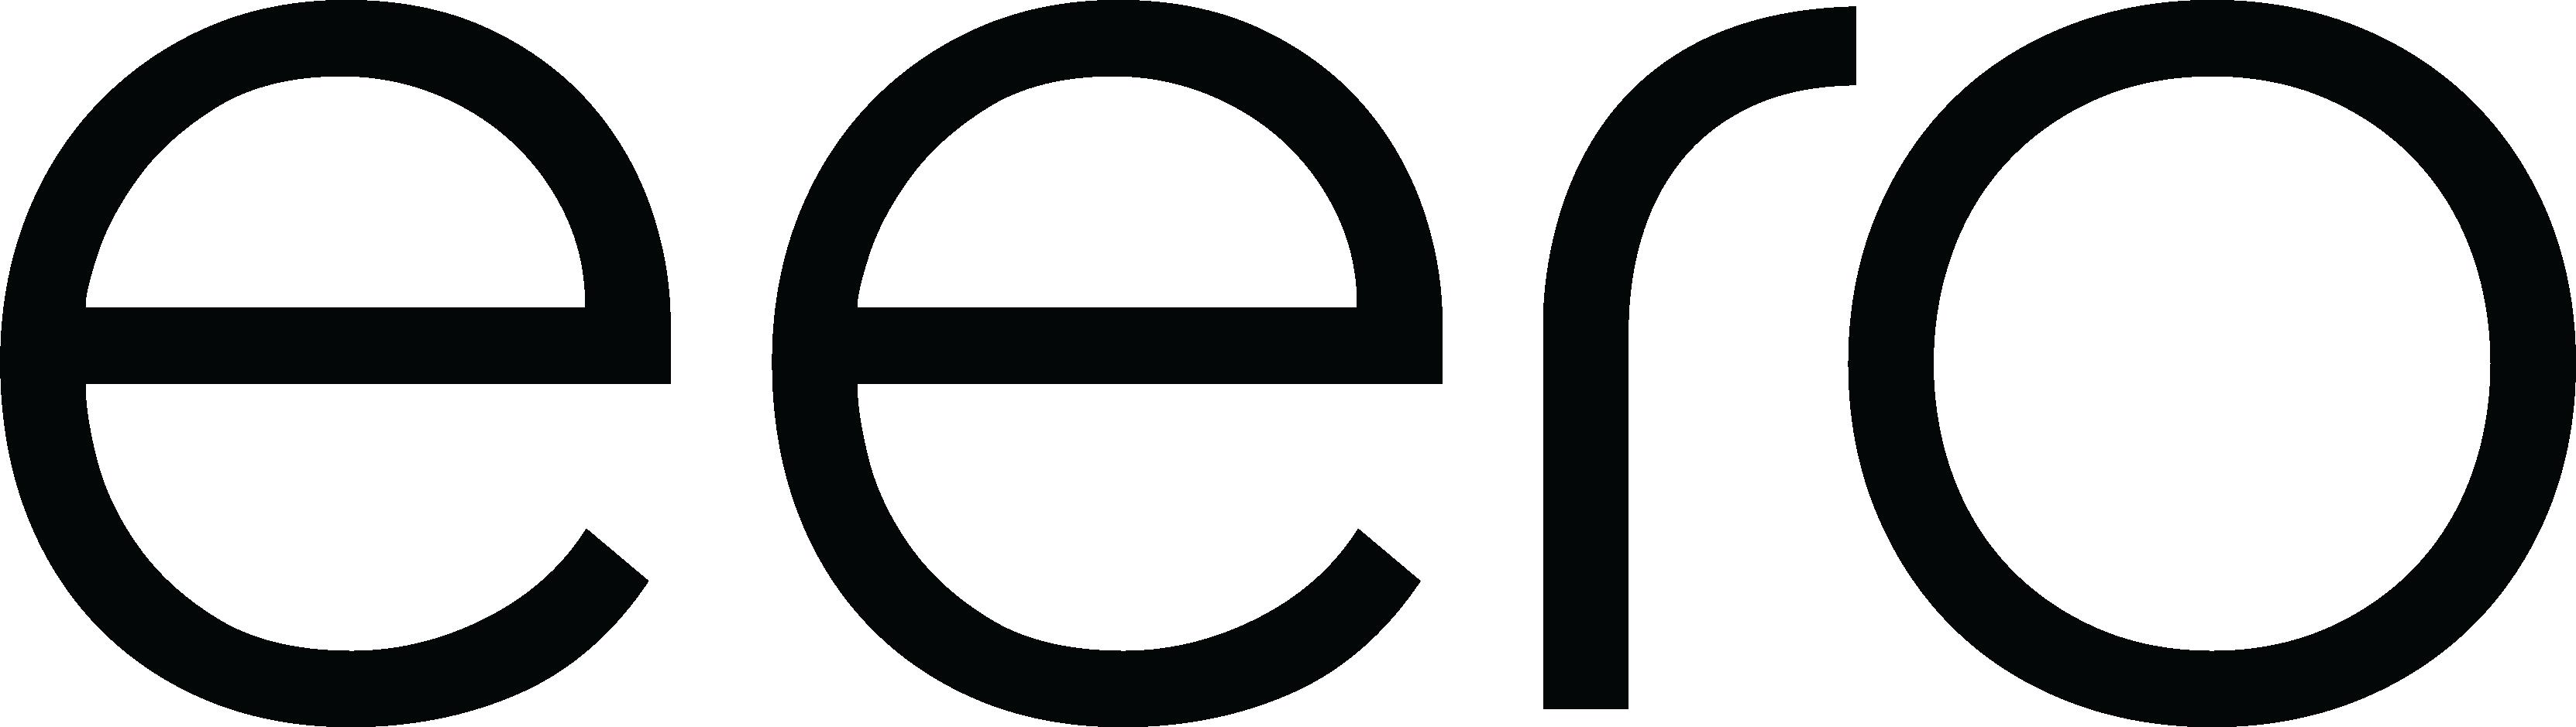 eero-logo-black